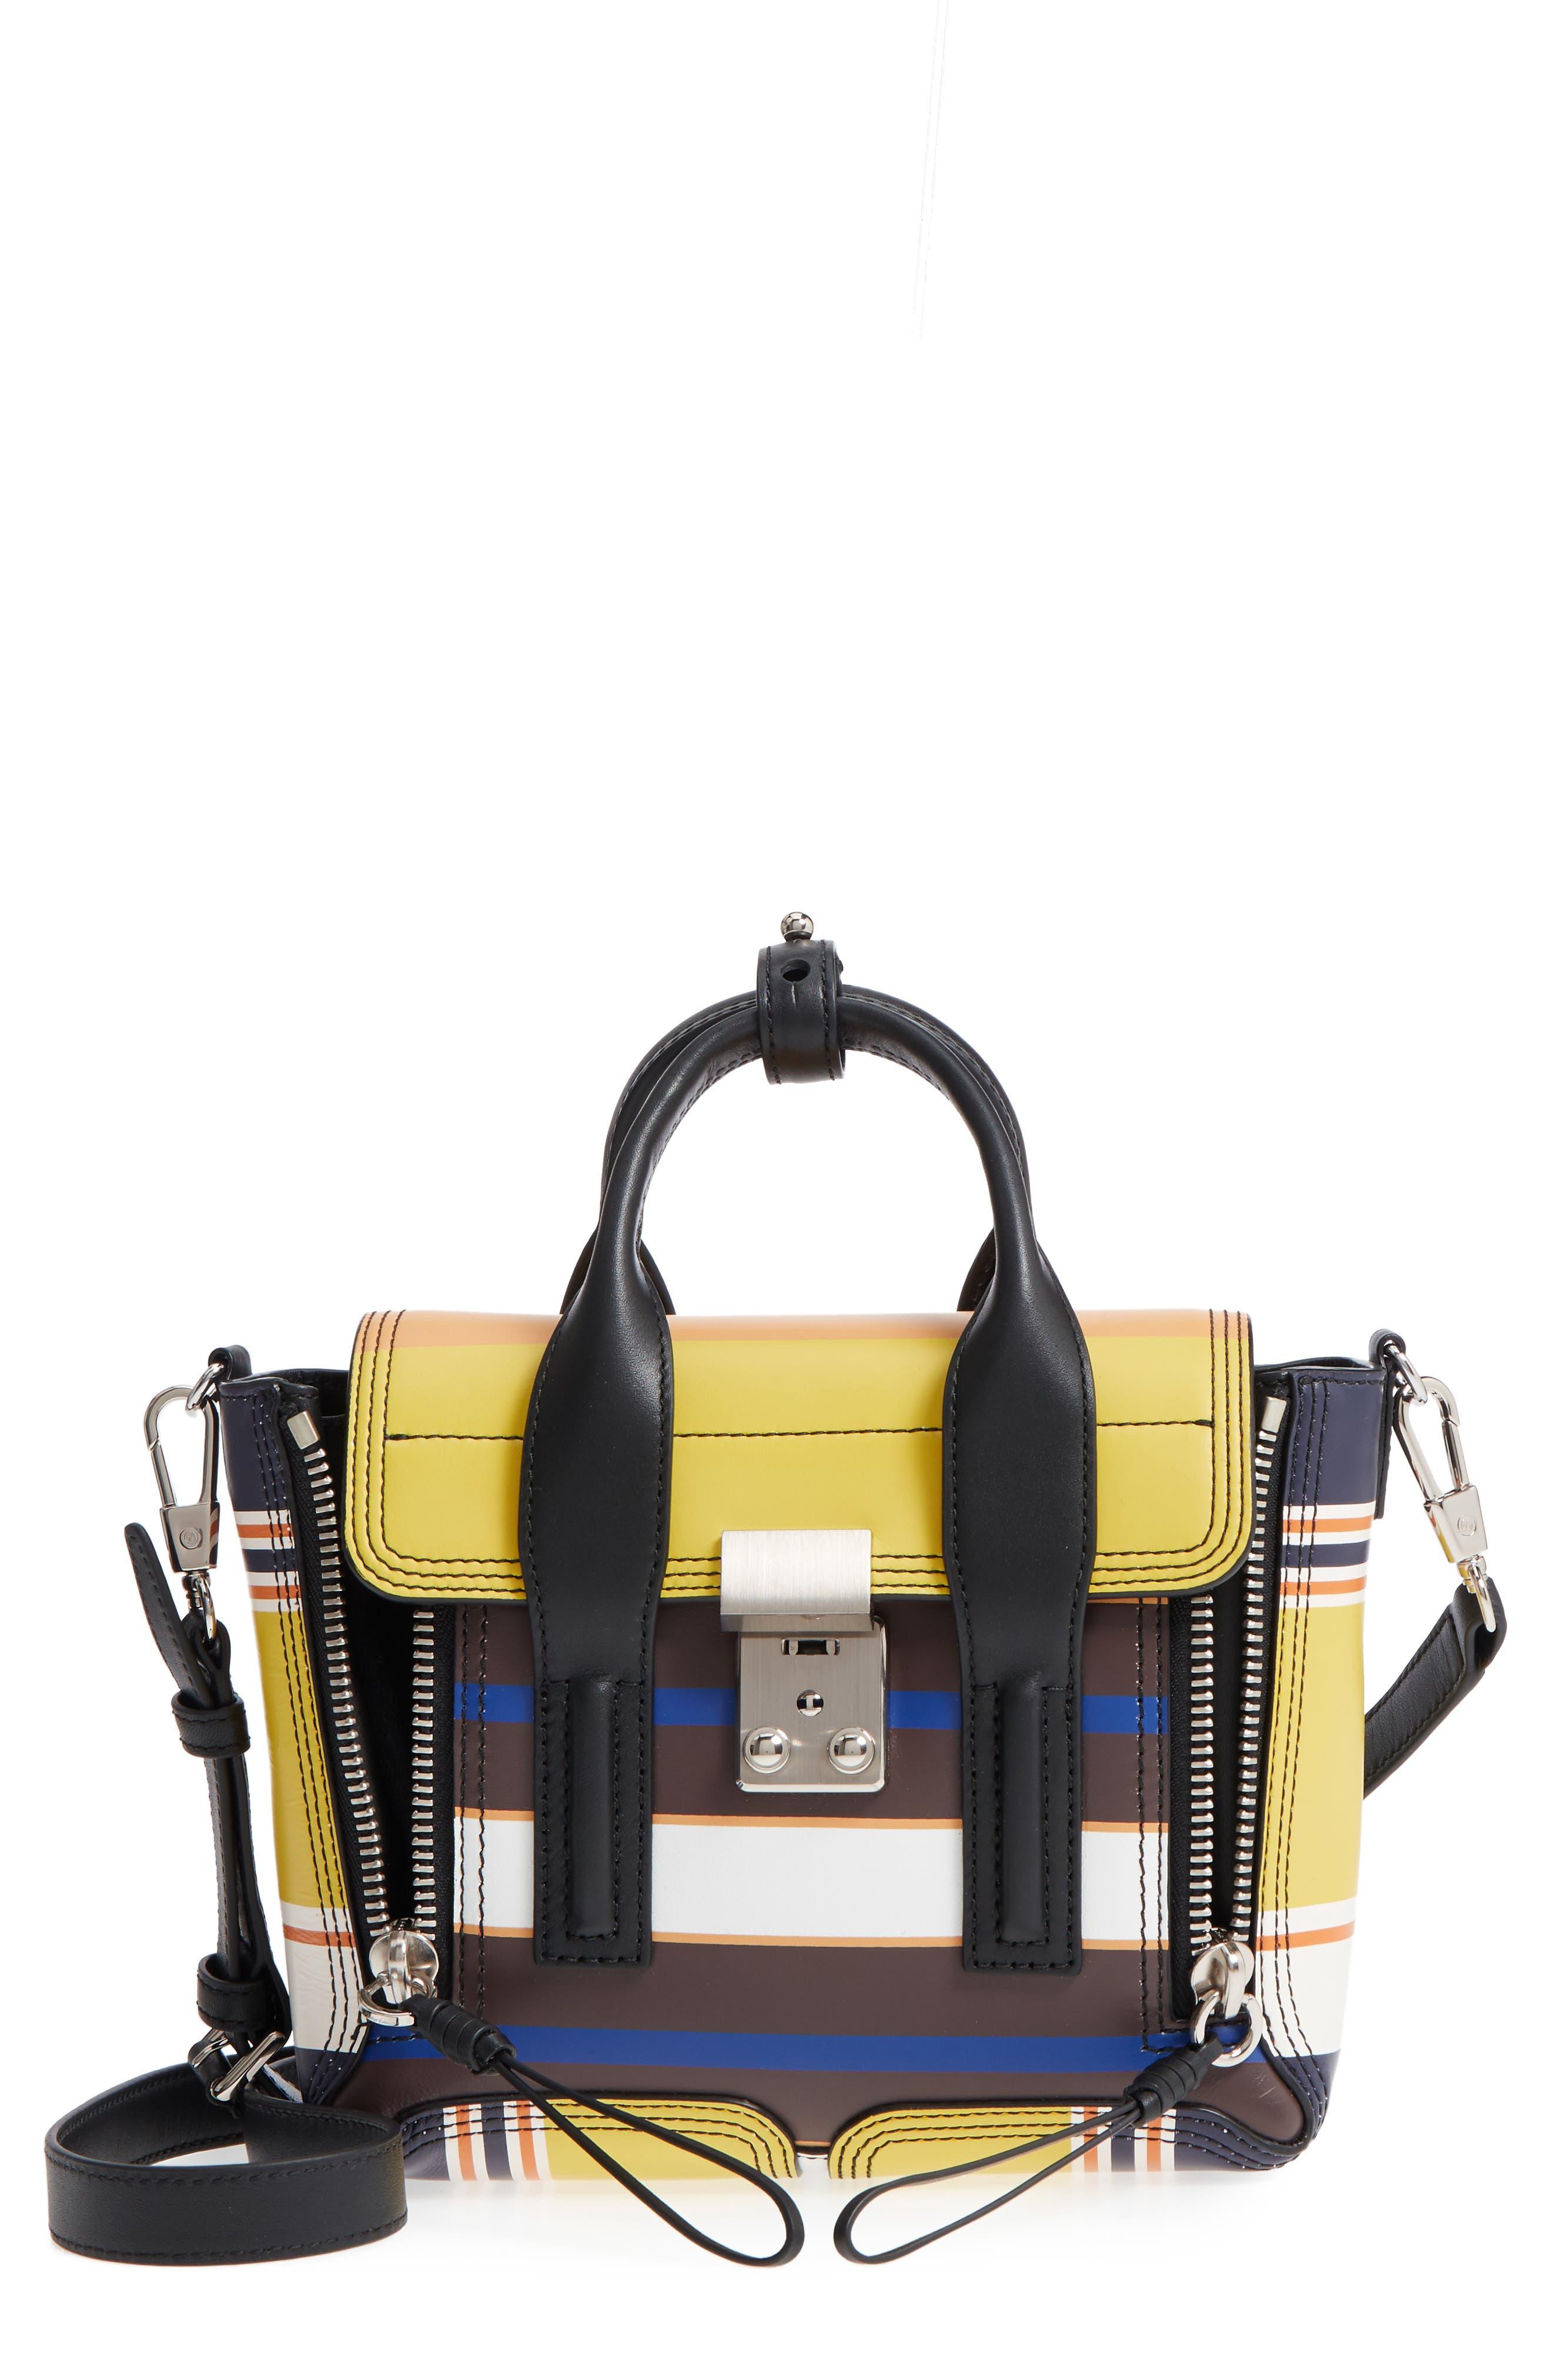 Main Image - 3.1 Phillip Lim Mini Pashli Stripe Leather Satchel